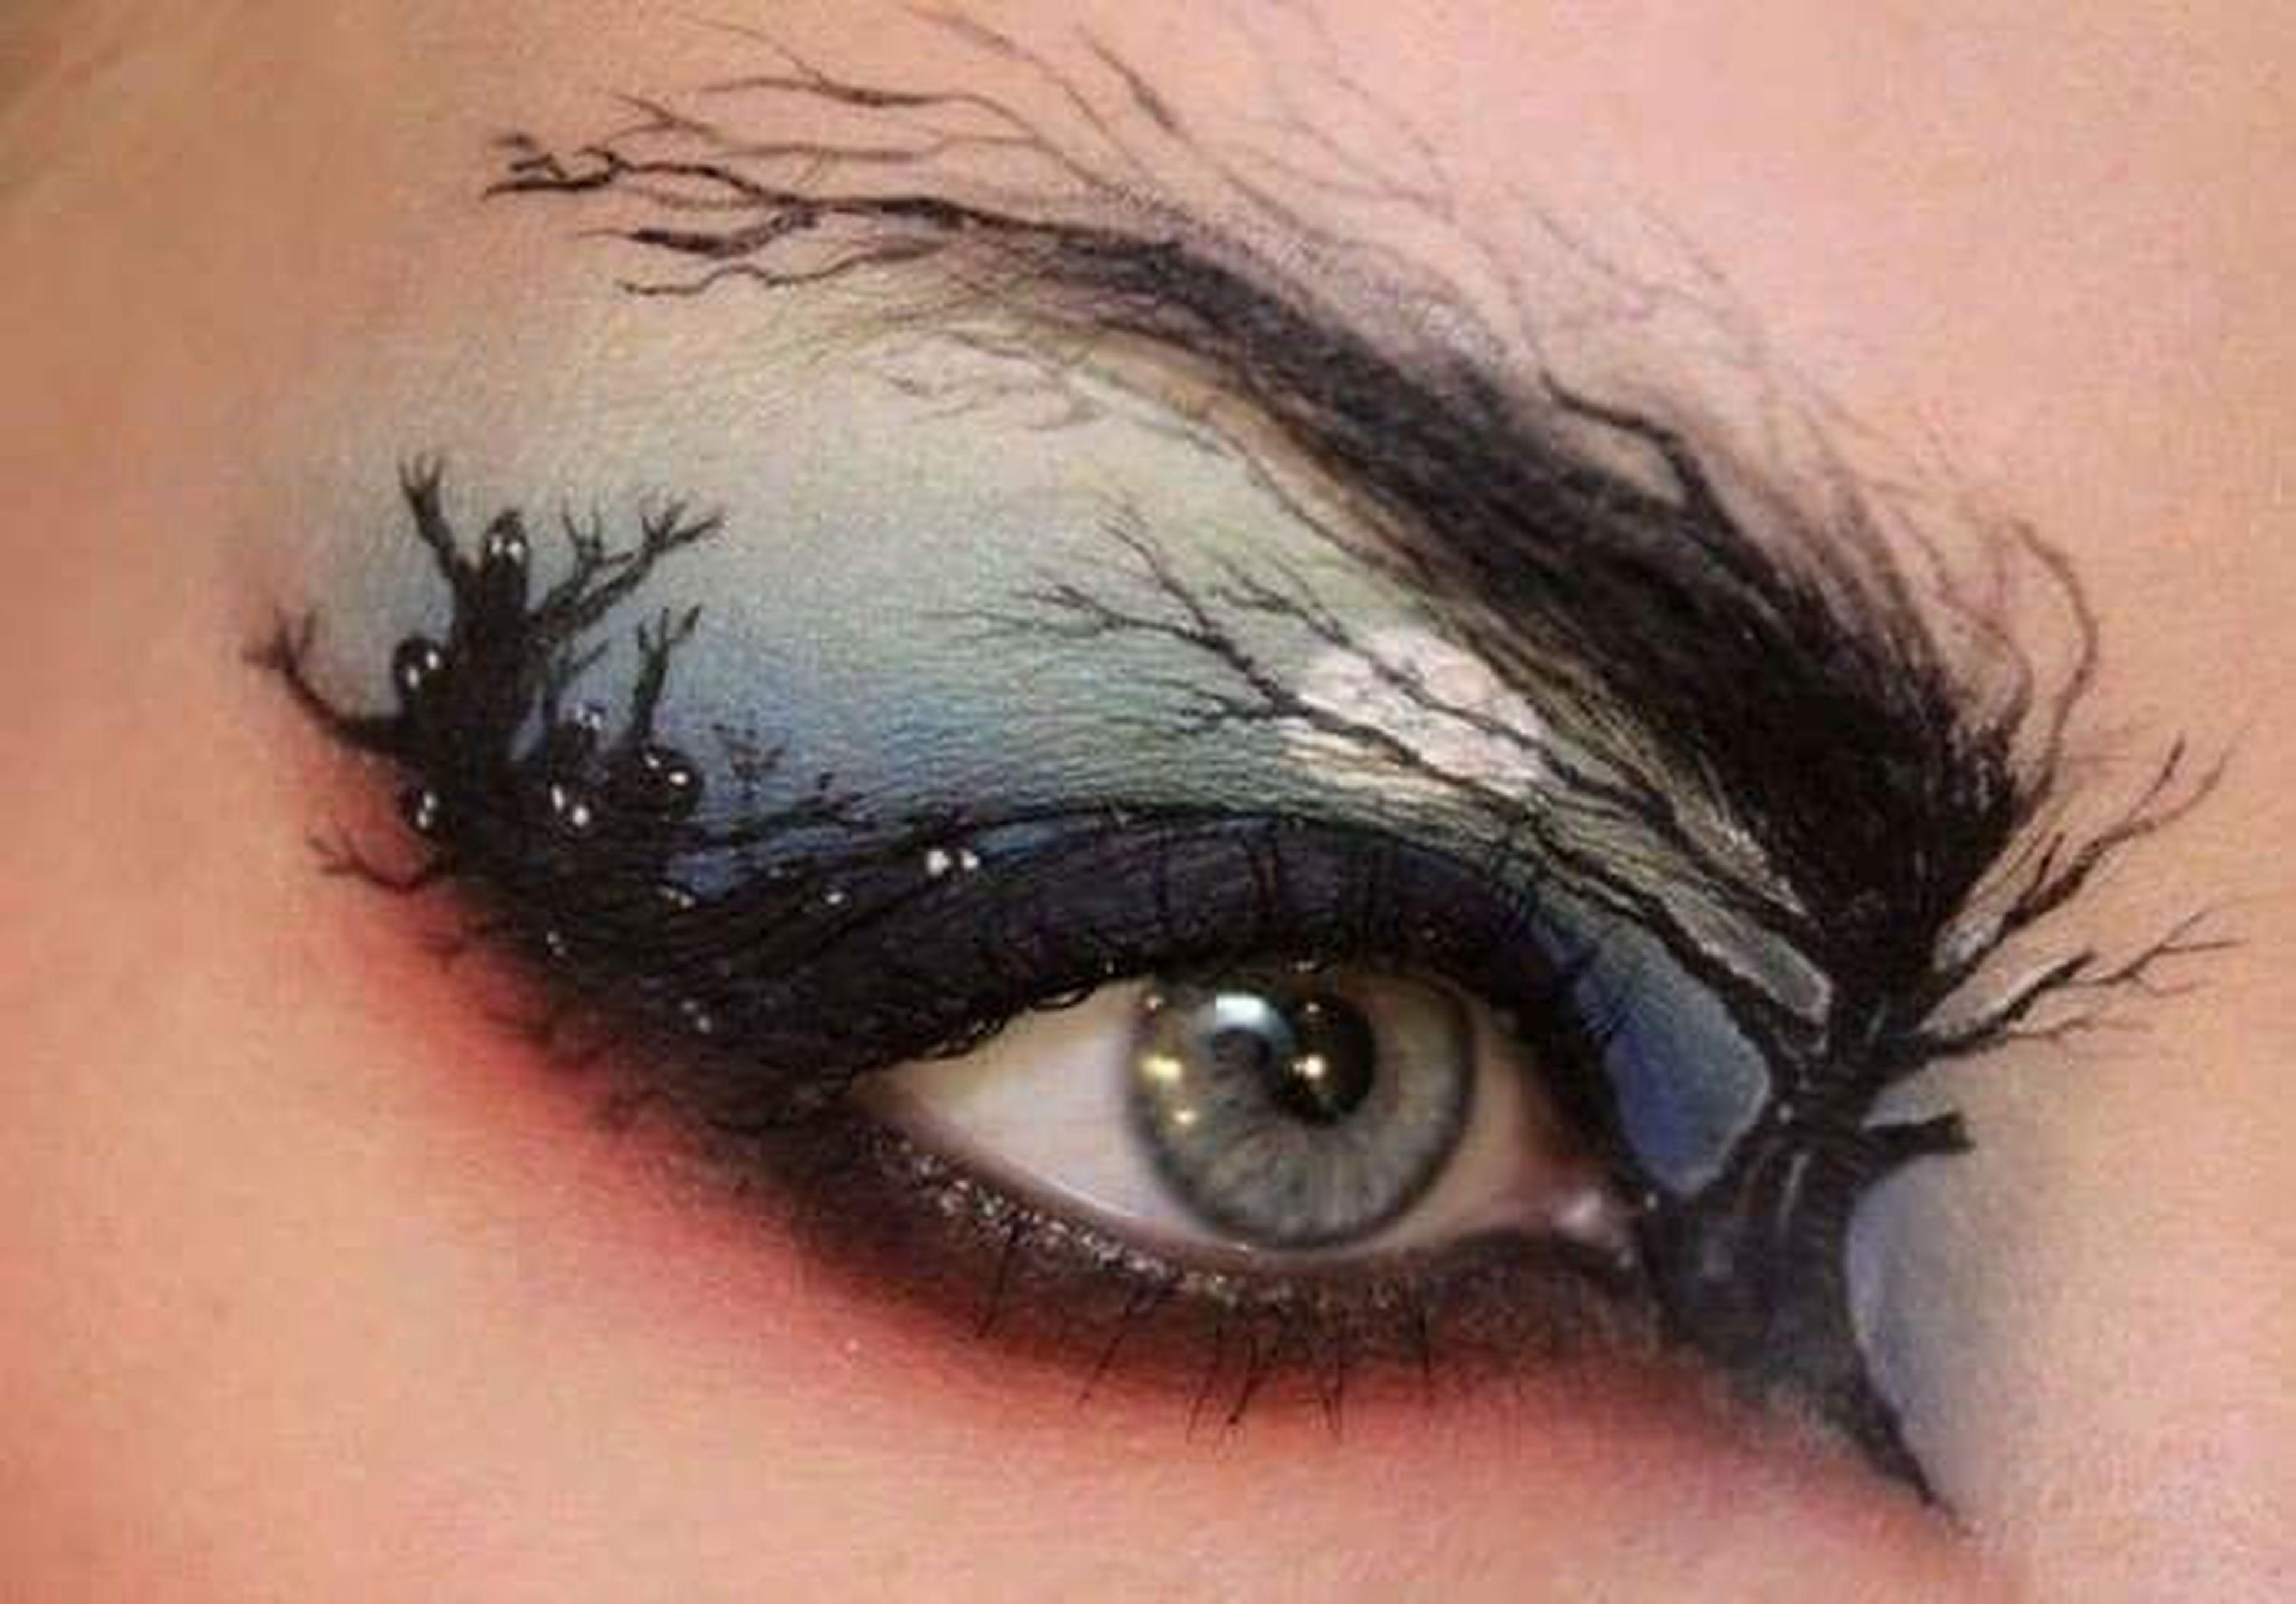 human eye, close-up, looking at camera, eyelash, eyesight, portrait, human skin, human face, young adult, headshot, part of, sensory perception, lifestyles, eyebrow, eyeball, extreme close-up, iris - eye